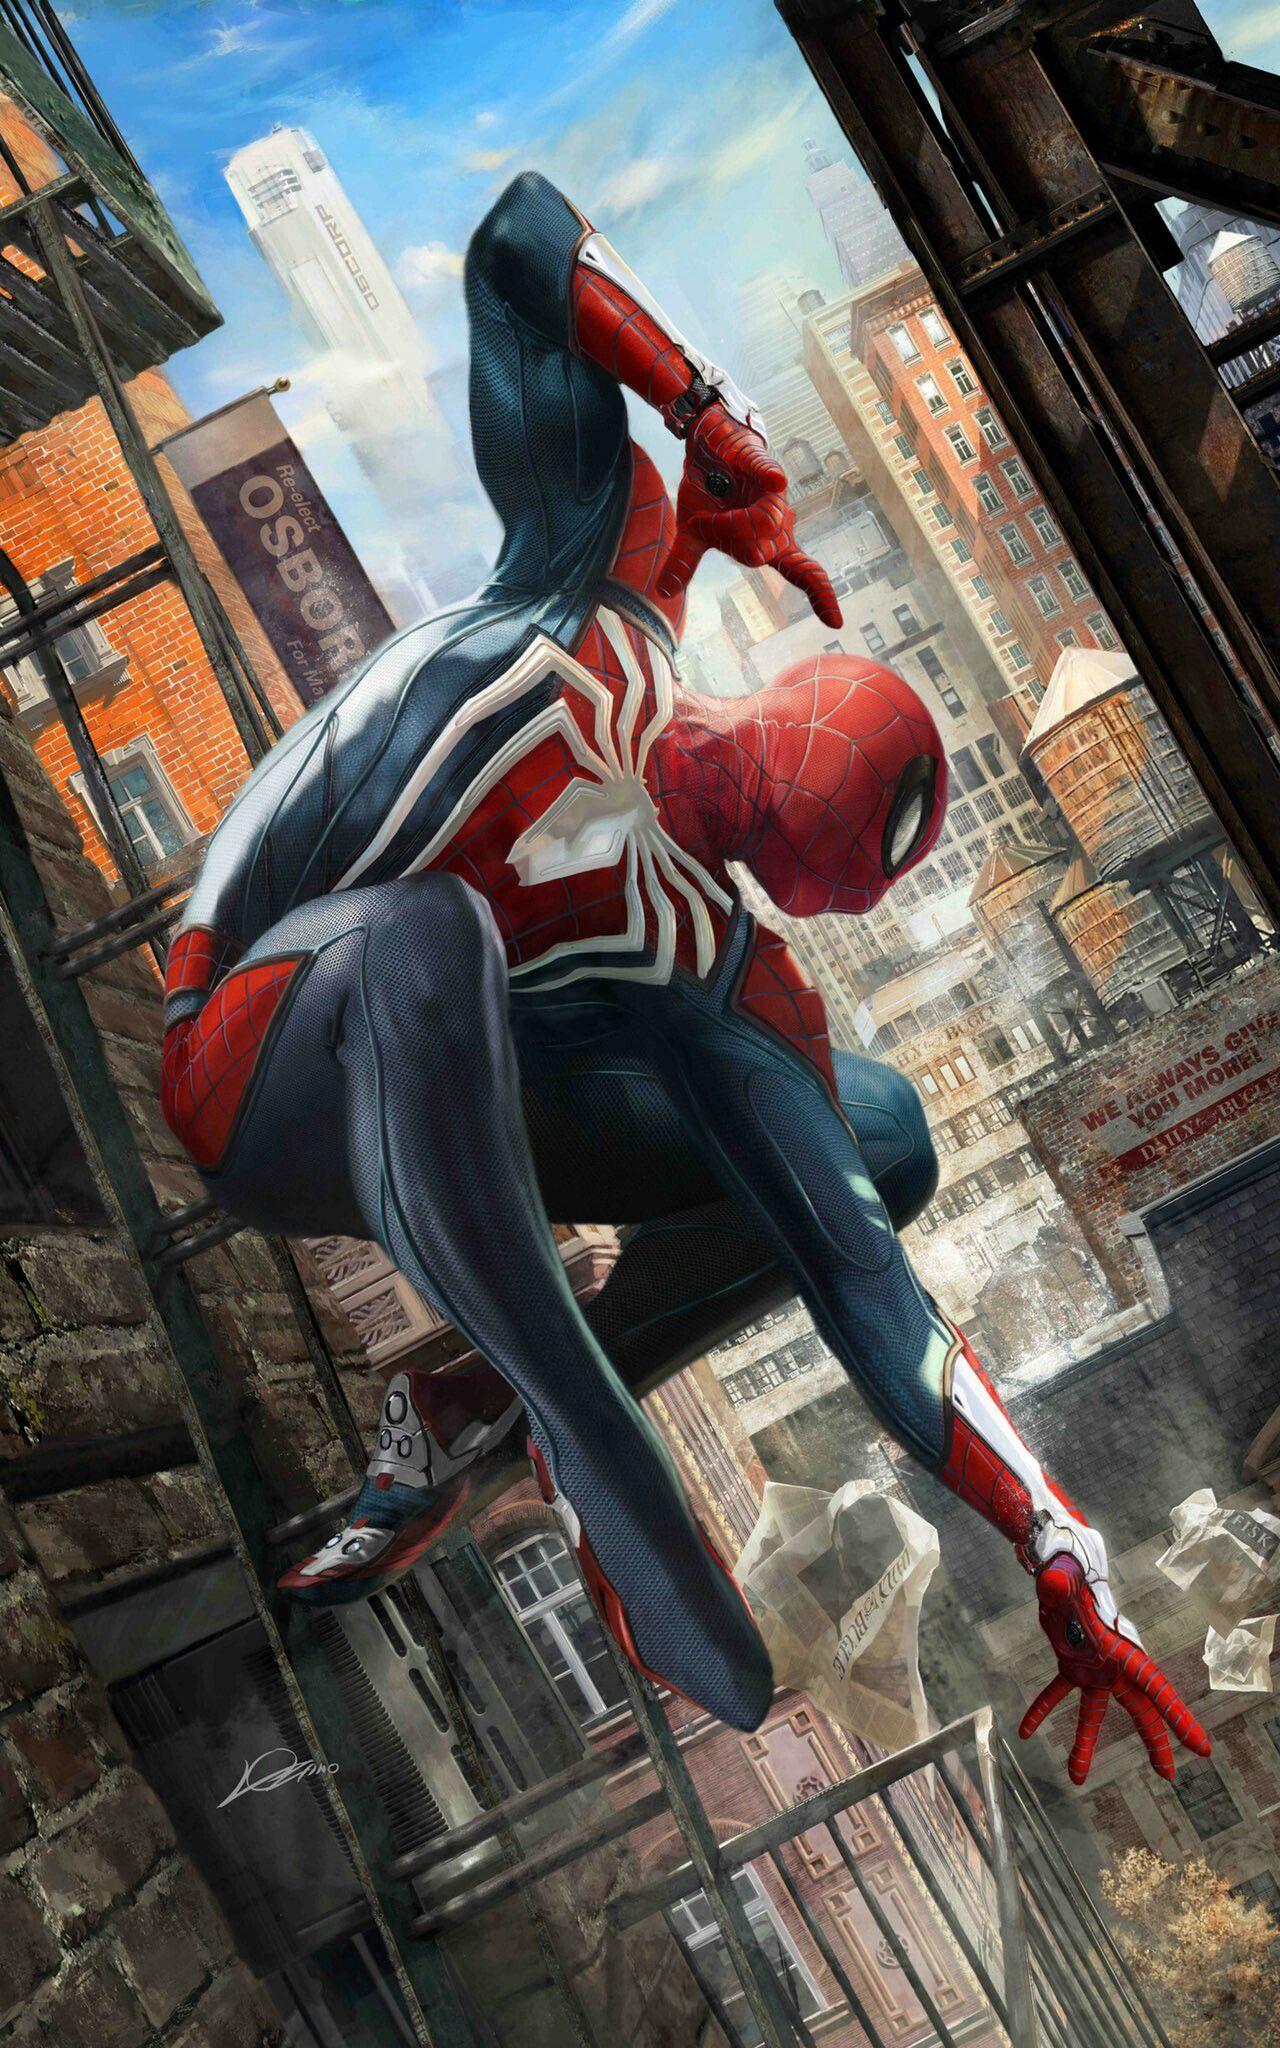 SpidermanPS4 Spider man playstation, Marvel comics